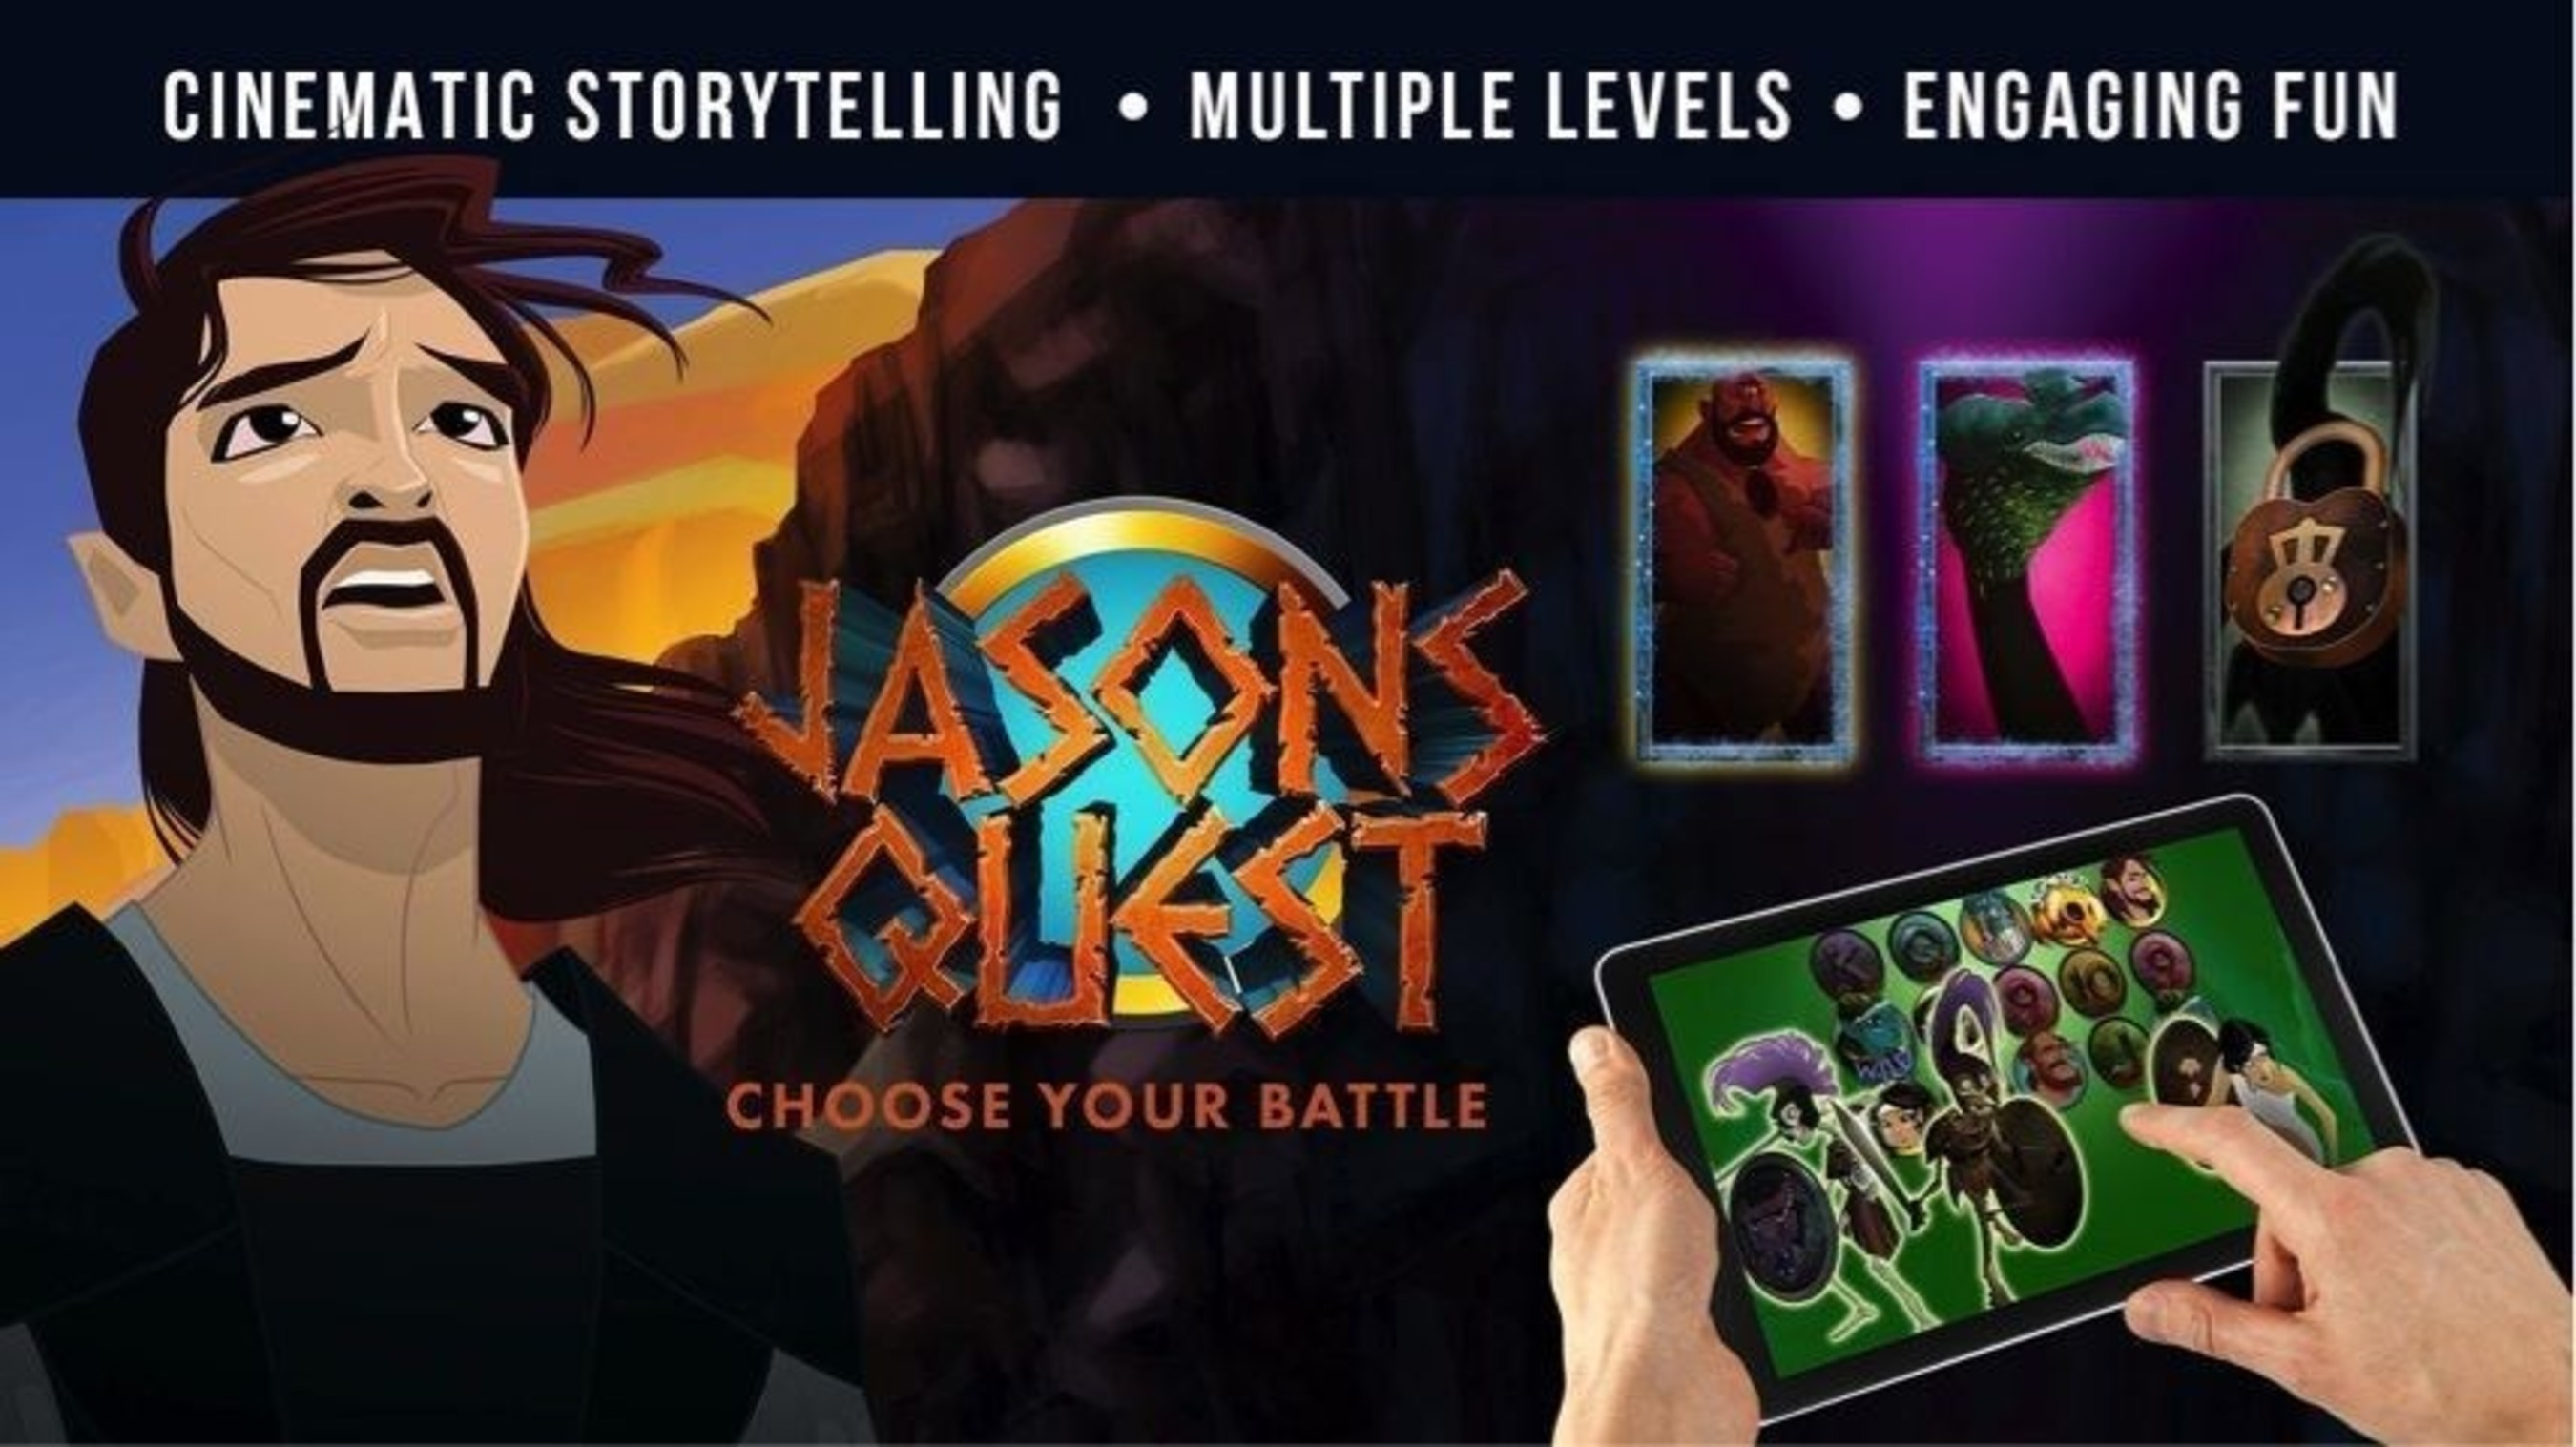 Genesis Gaming Announces Jason's Quest Video Slot Game